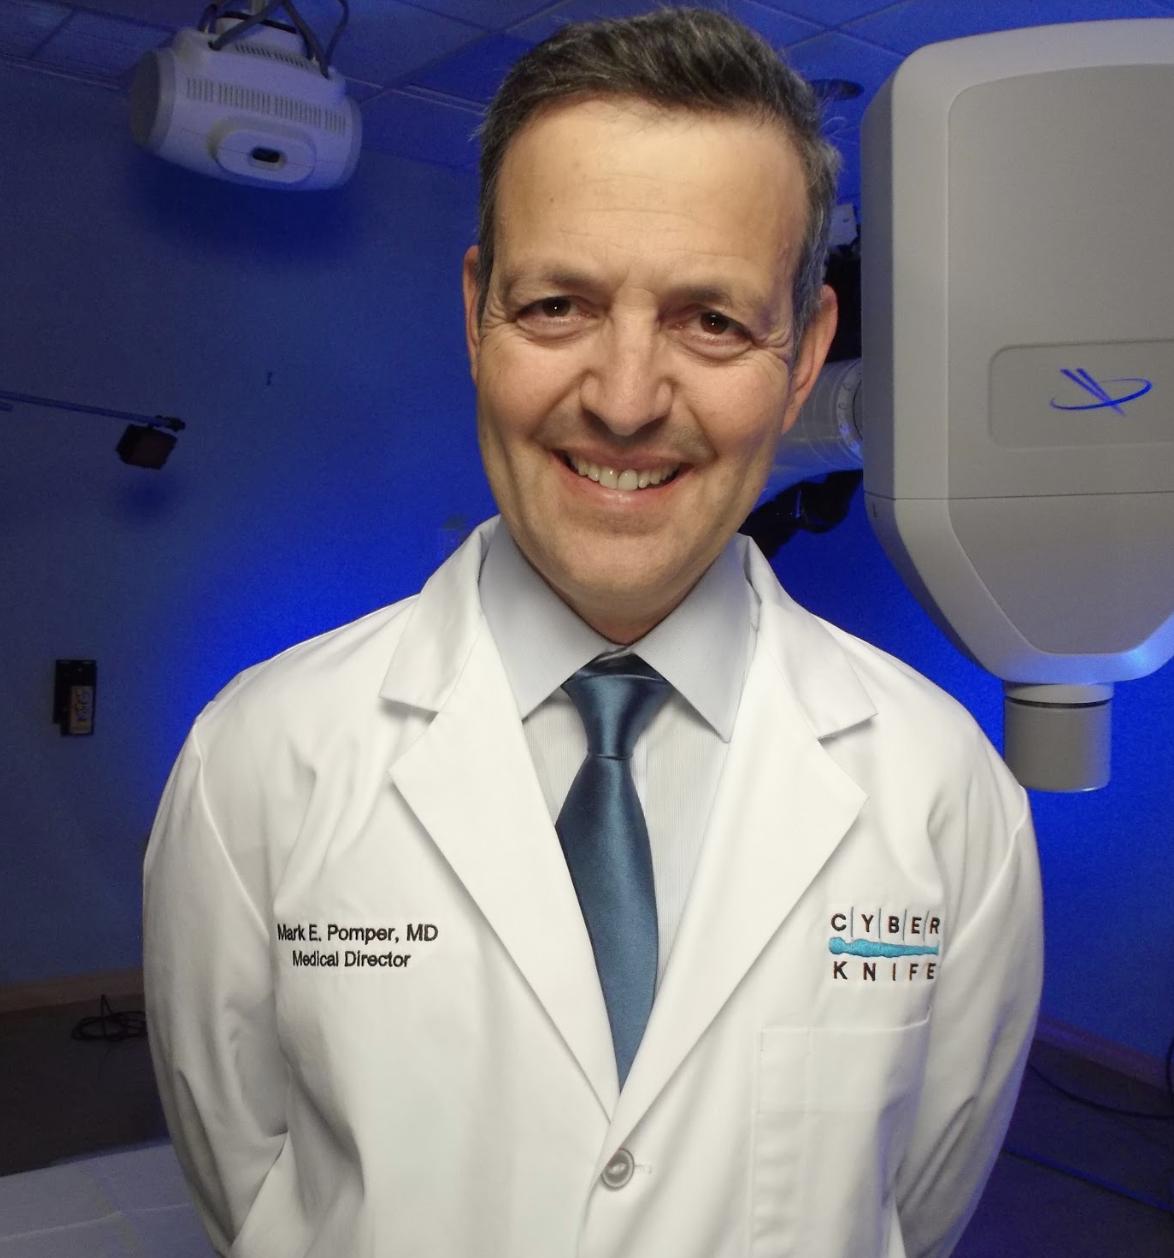 cyberknife miami - alternative cancer treatment - cancer treatment in south florida